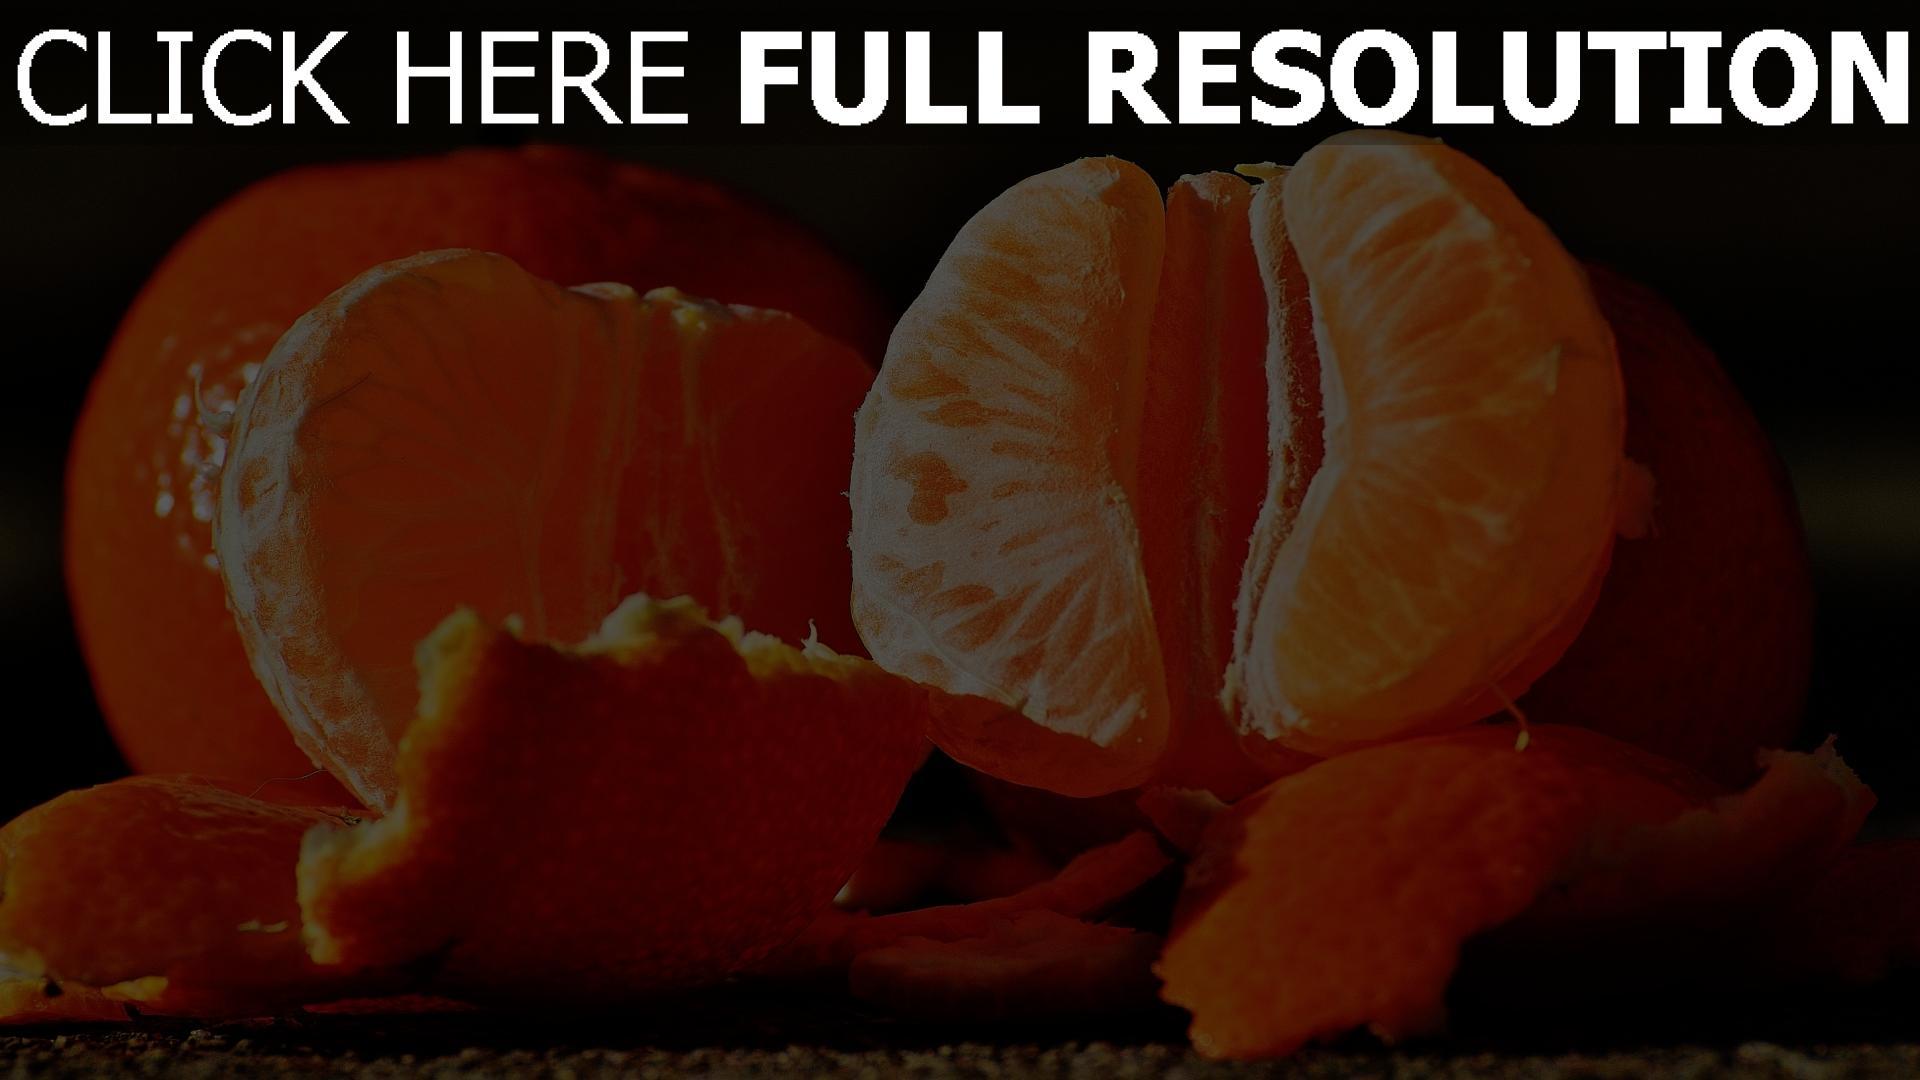 hd hintergrundbilder schälen obst mandarinen 1920x1080